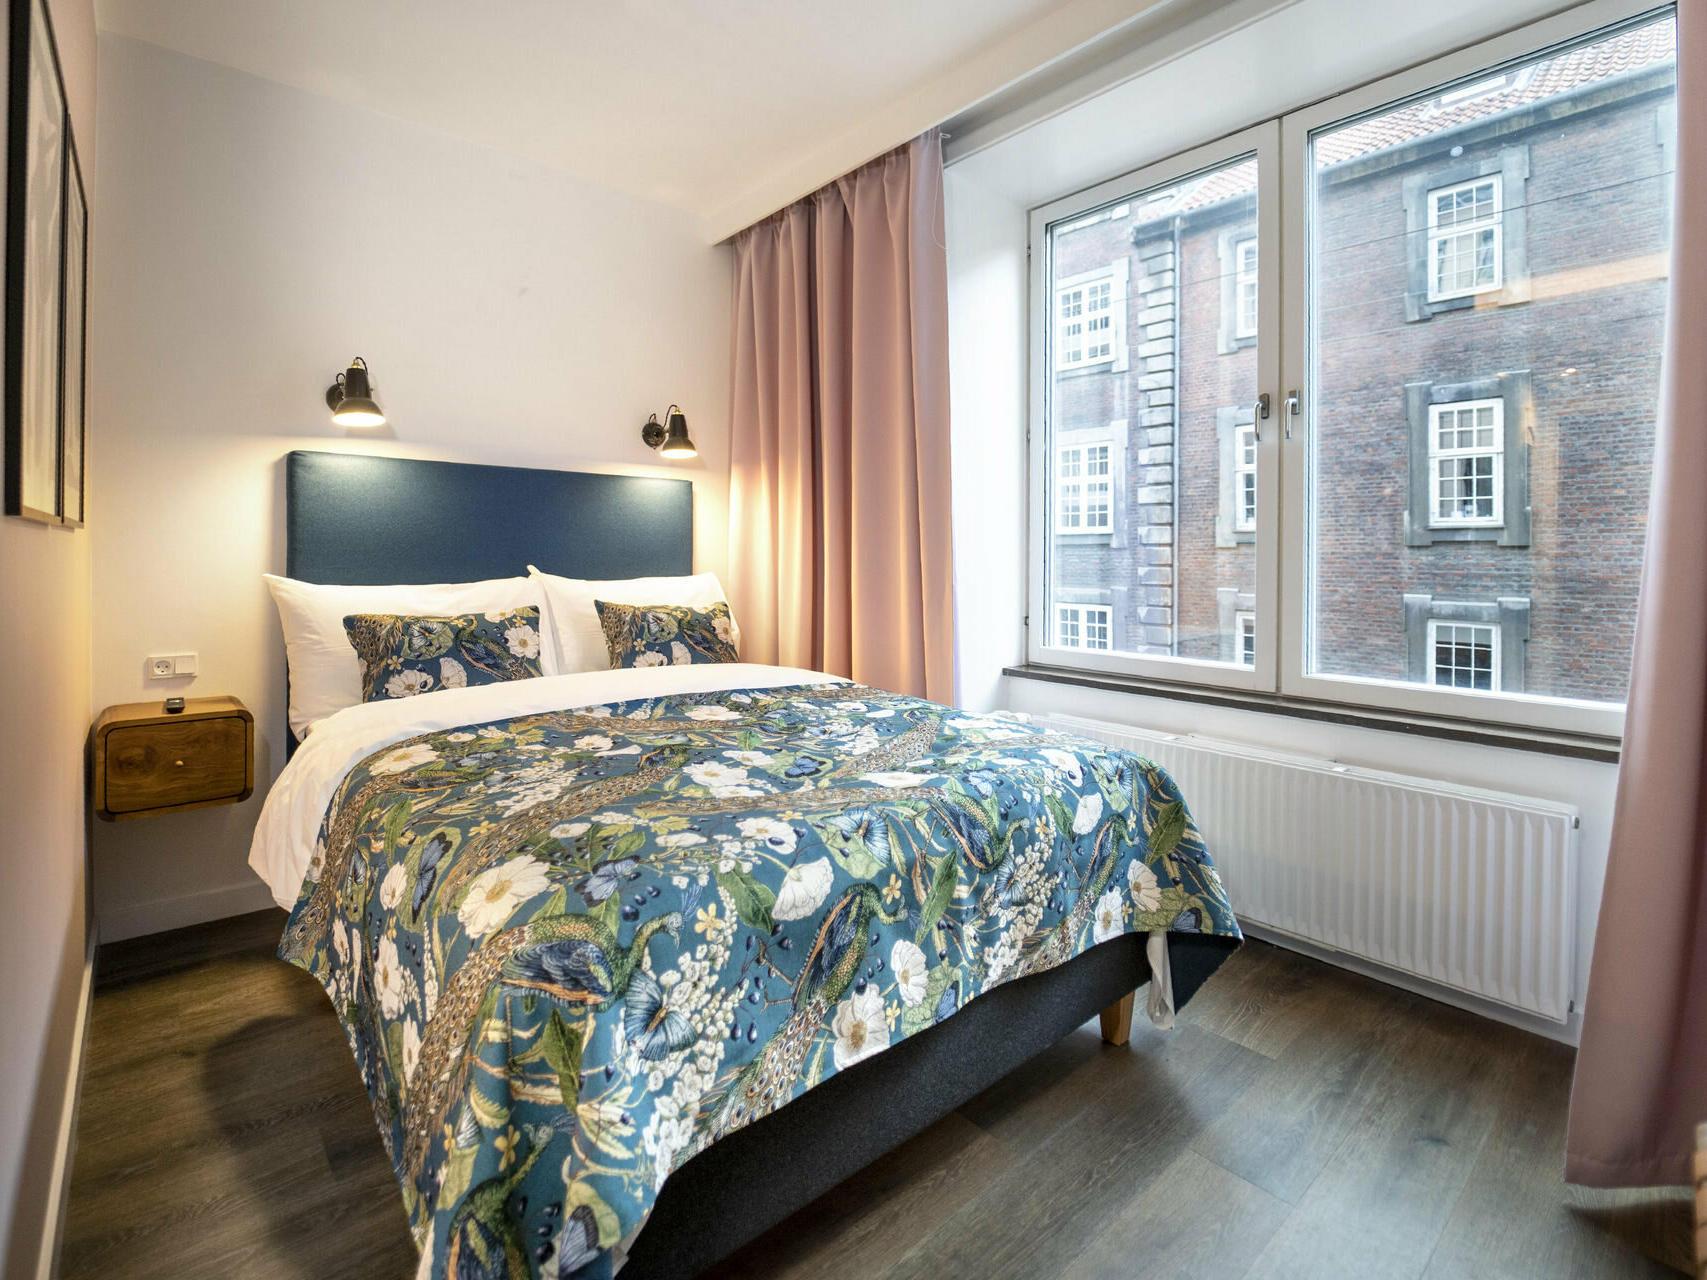 Pocket - small double room in hotel h27 Copenhagen